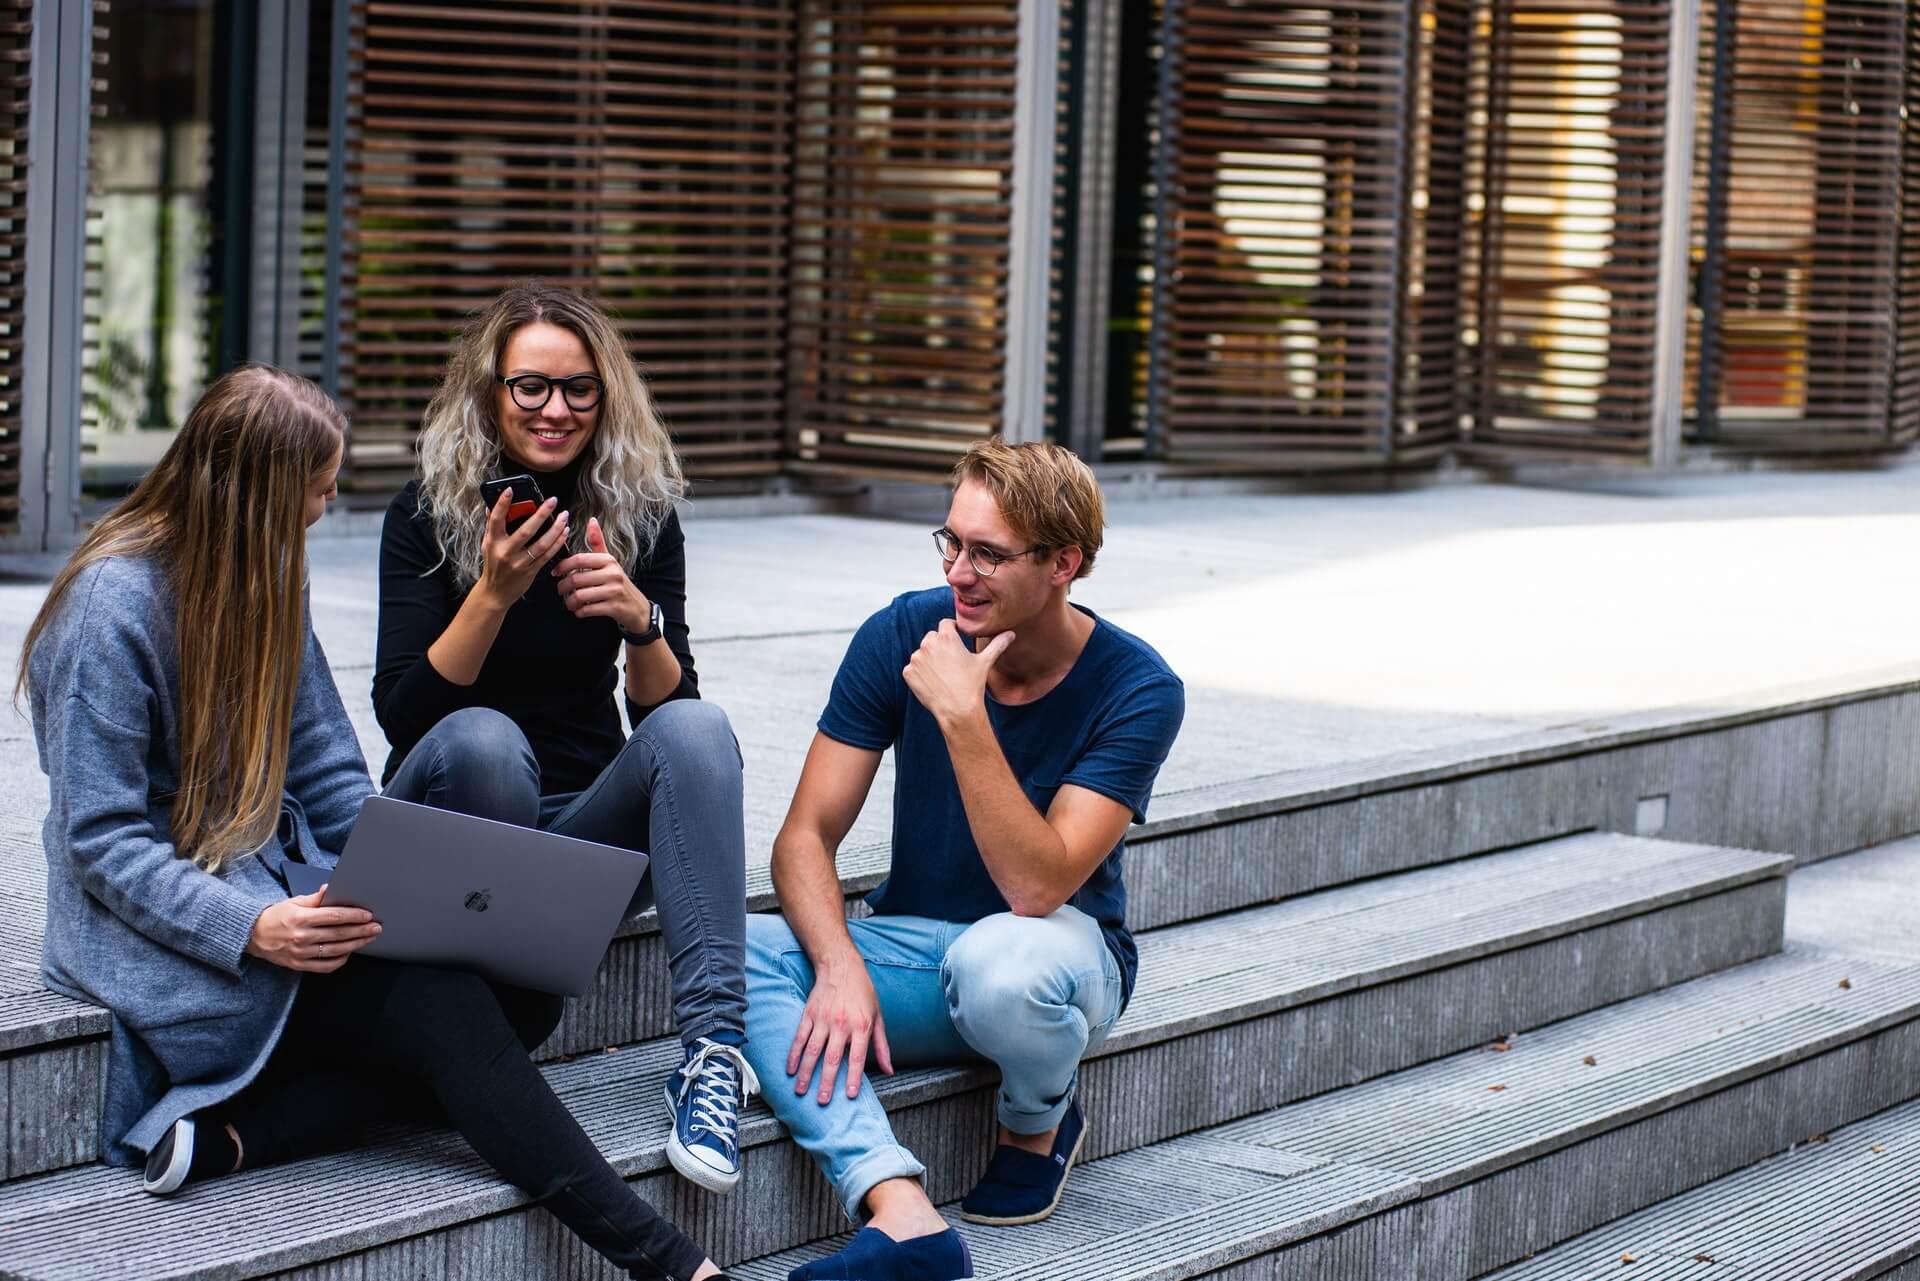 studenten ratgeber - studium finanzieren